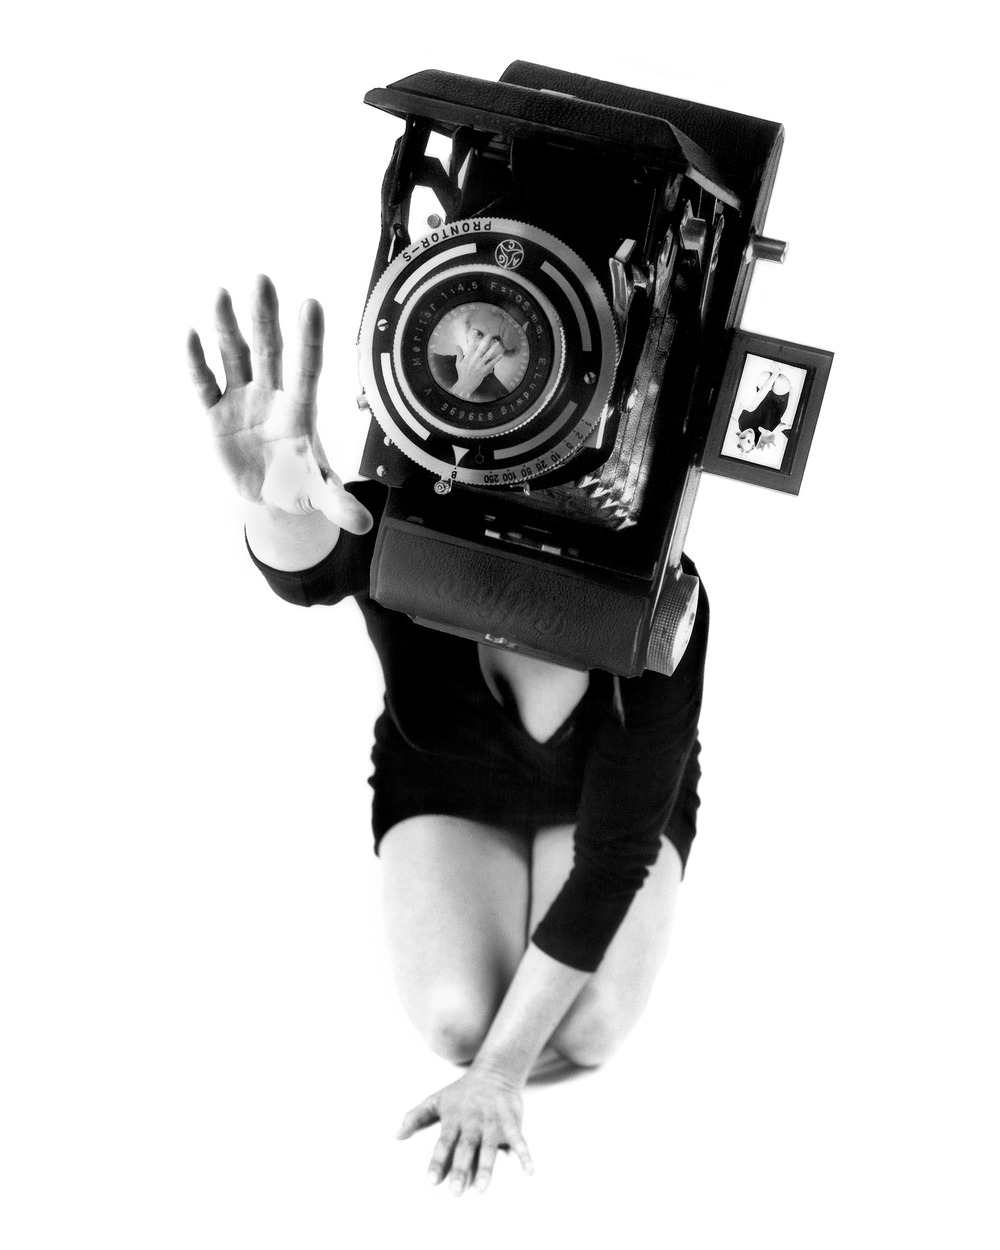 Lynn Hershman Leeson, Reach aus der Serie Phantom Limb, 1987 Silbergelatineabzug auf Hadernpapier, Foto: Lynn Hershman Leeson © Lynn Hershman Leeson